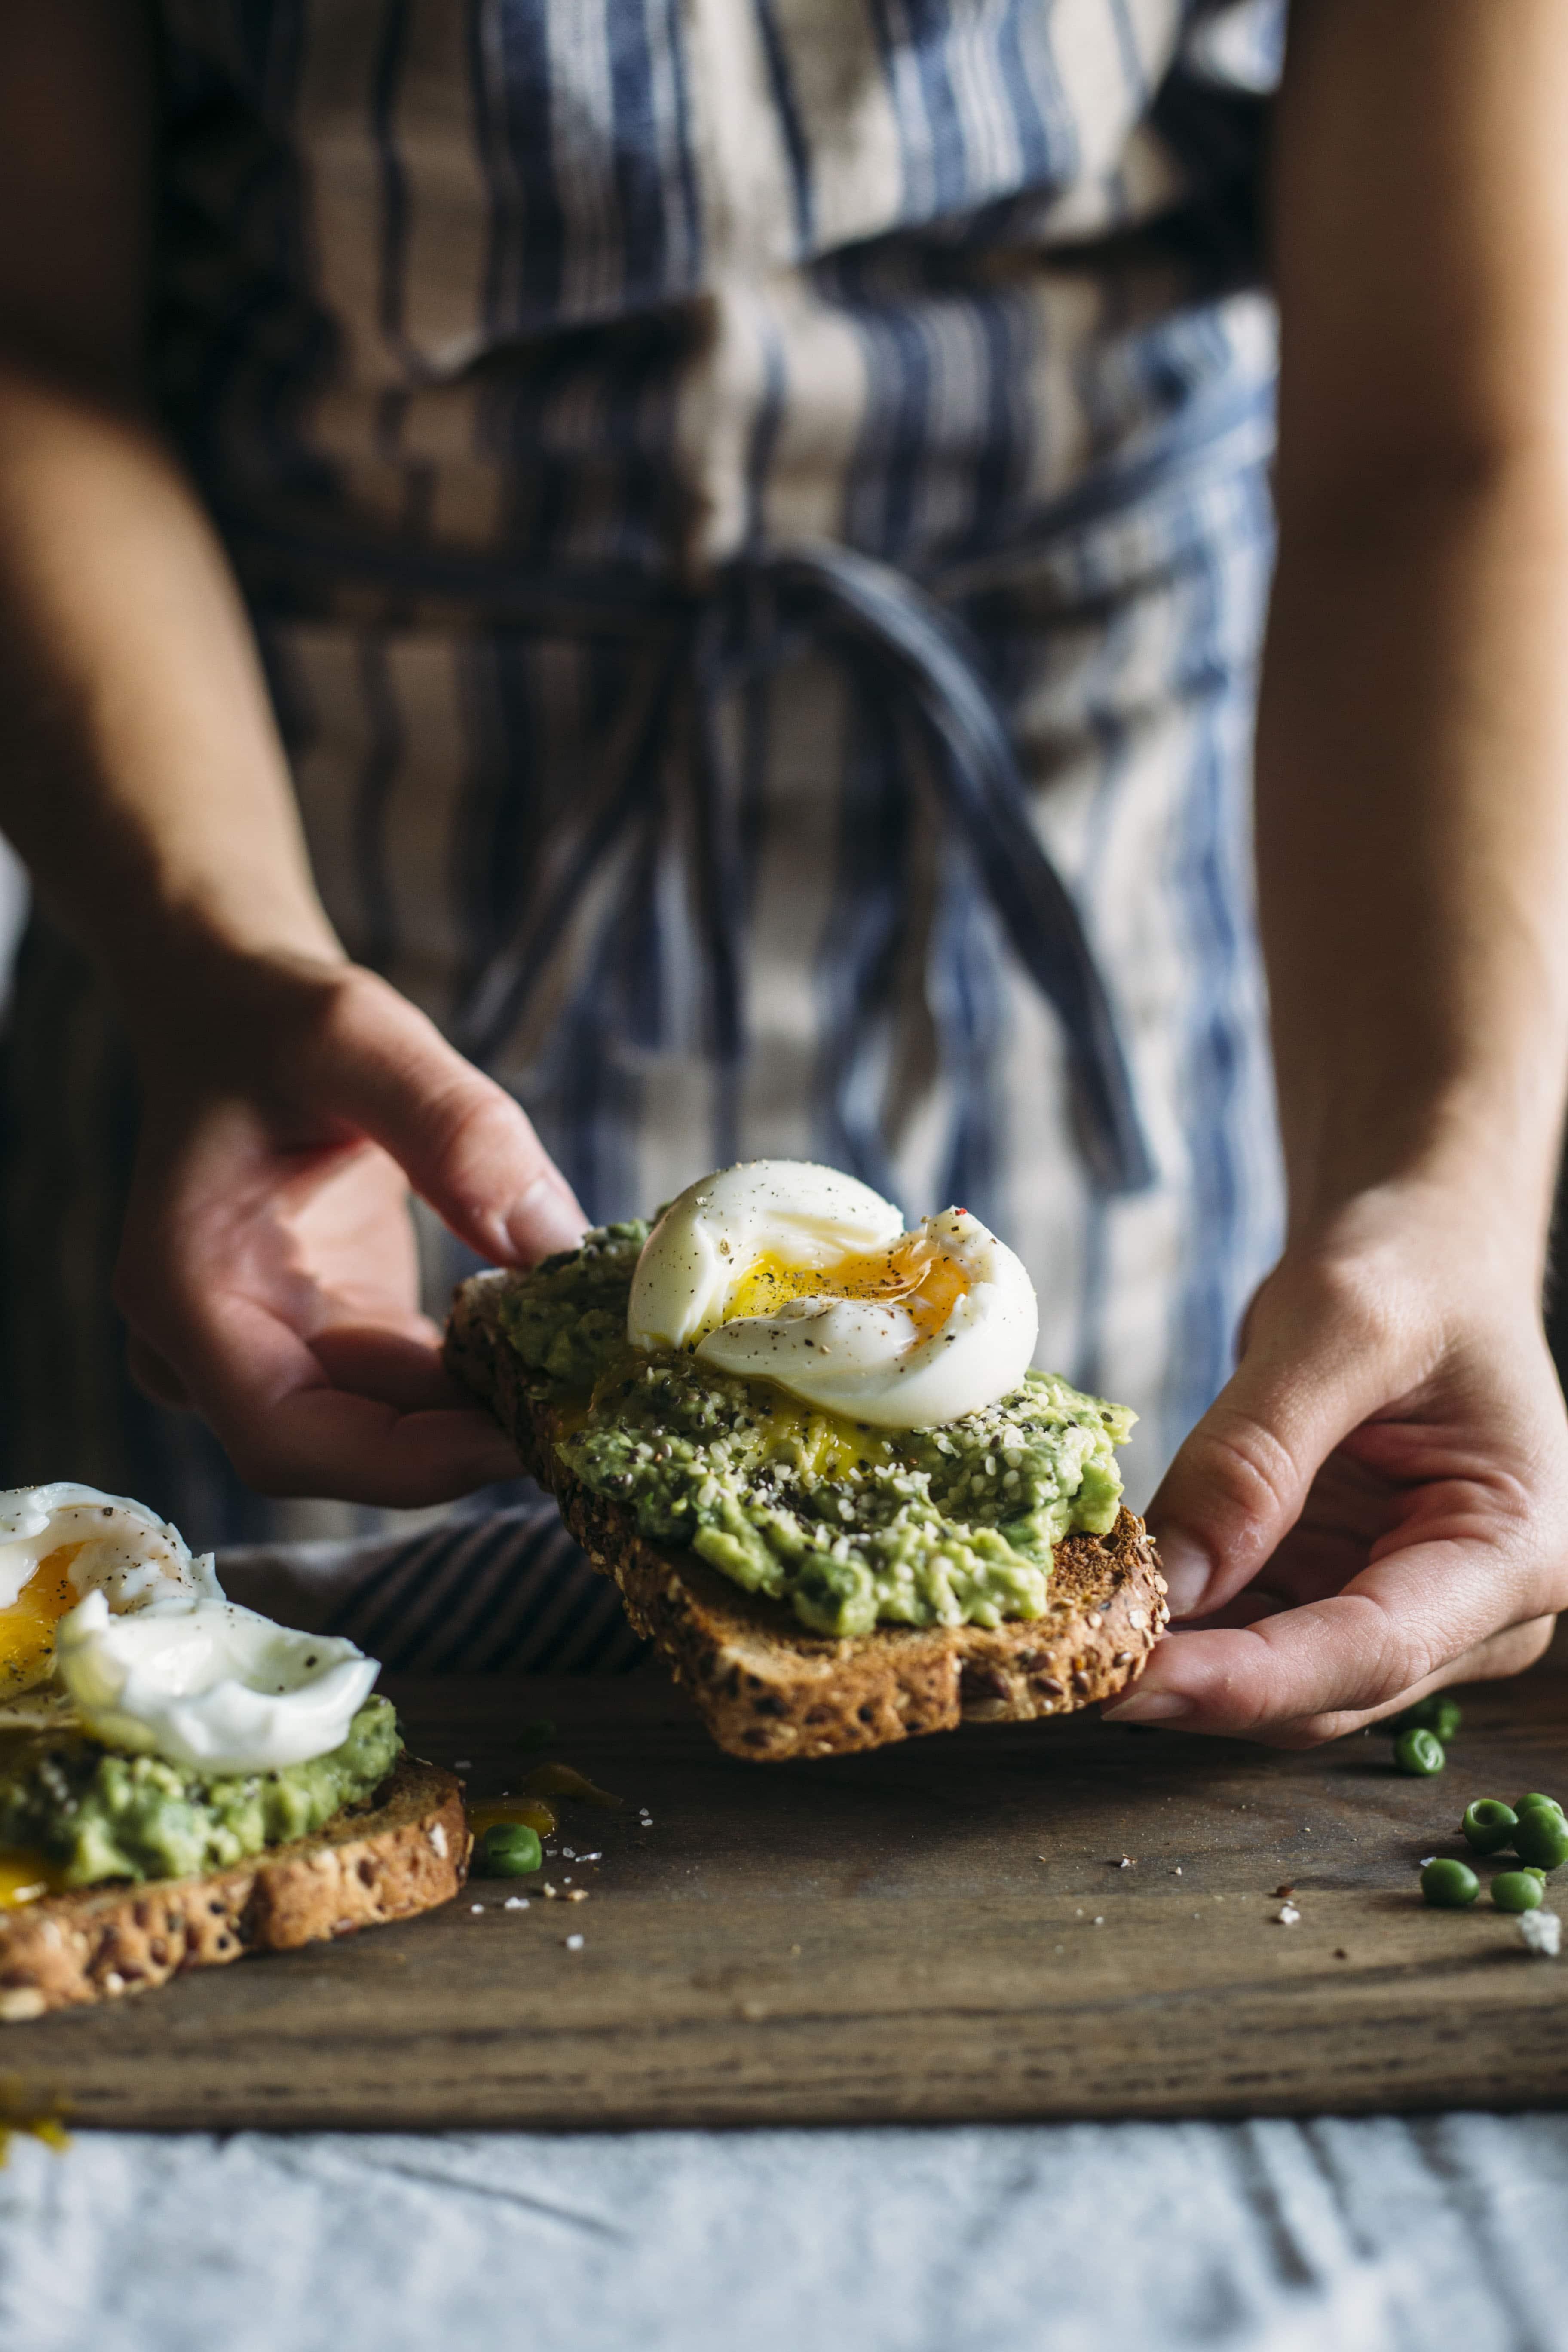 Superfood Toast | Toast topped with avocado pea mash and superfoods like hemp seeds!